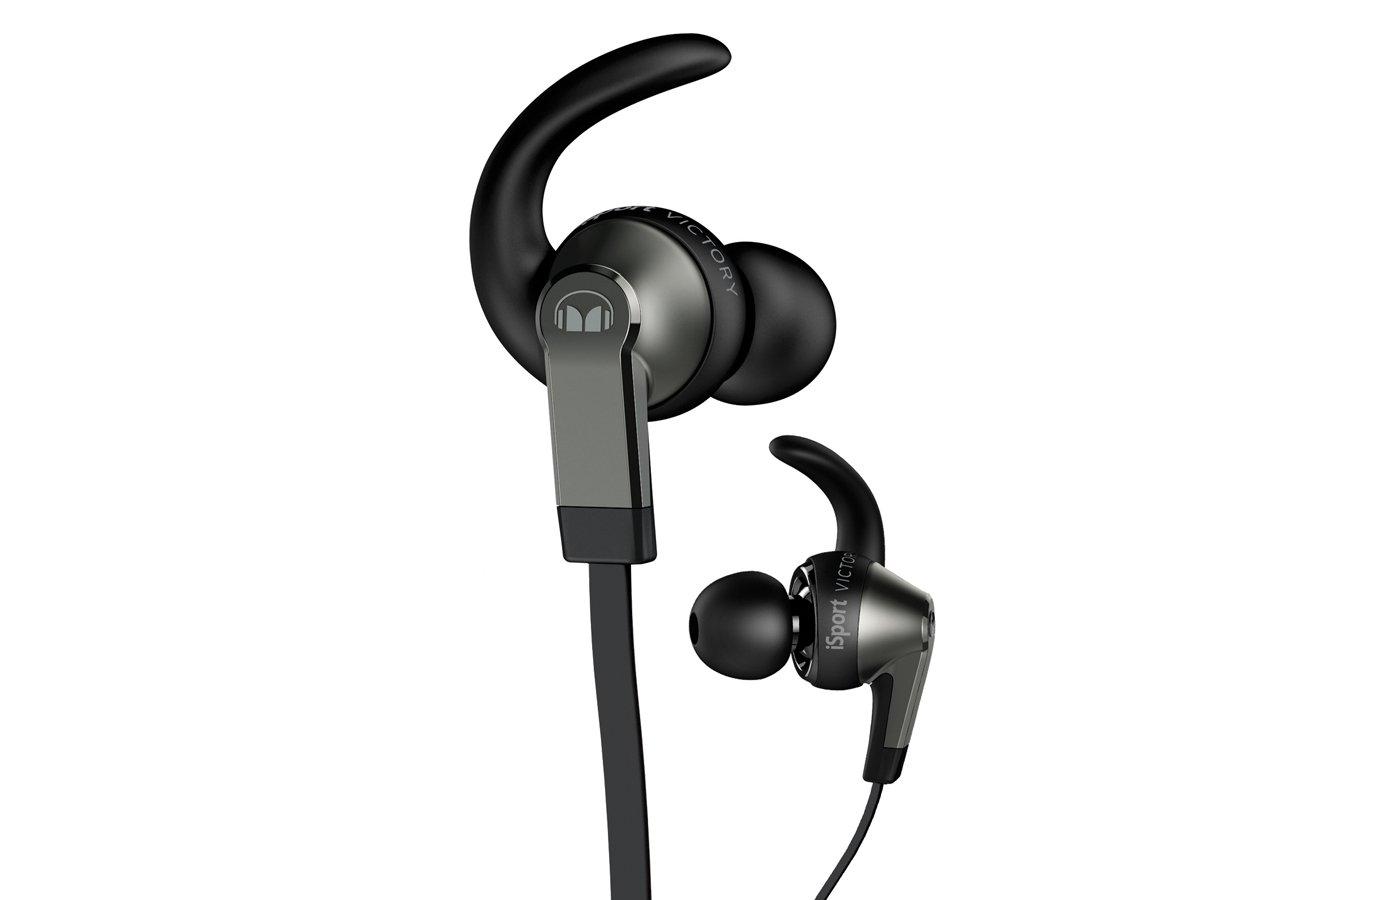 How To Buy Fostex 250 OHM Semi-Open Professional Dynamic Headphones Includes Bonus Slappa Headphone Case